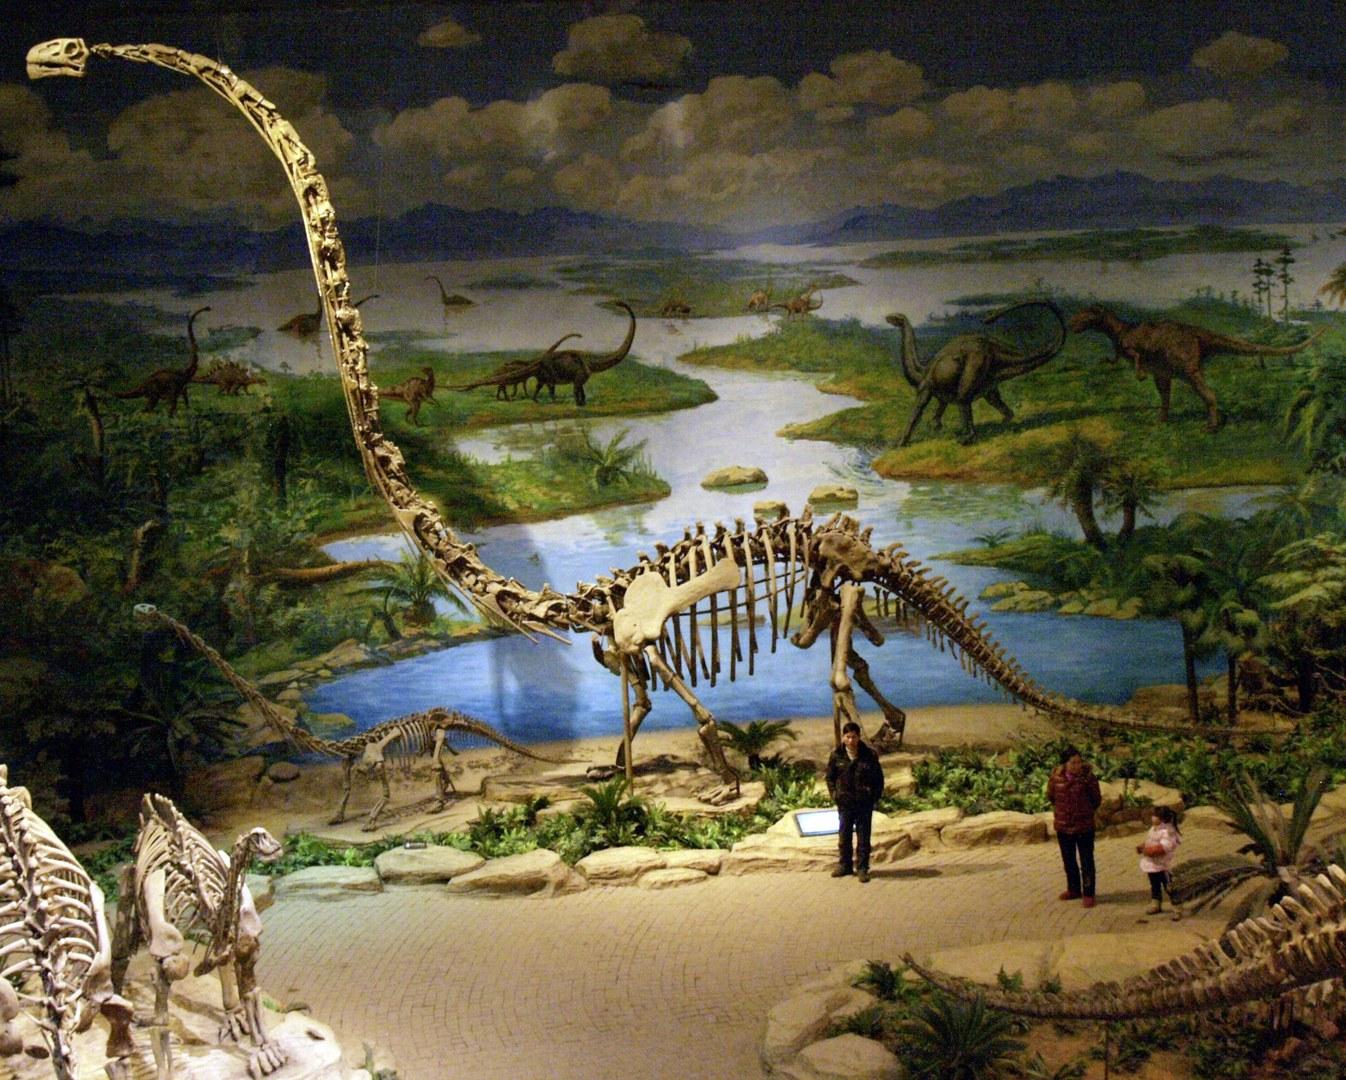 Mamenchisaurus mit extrem langem Hals